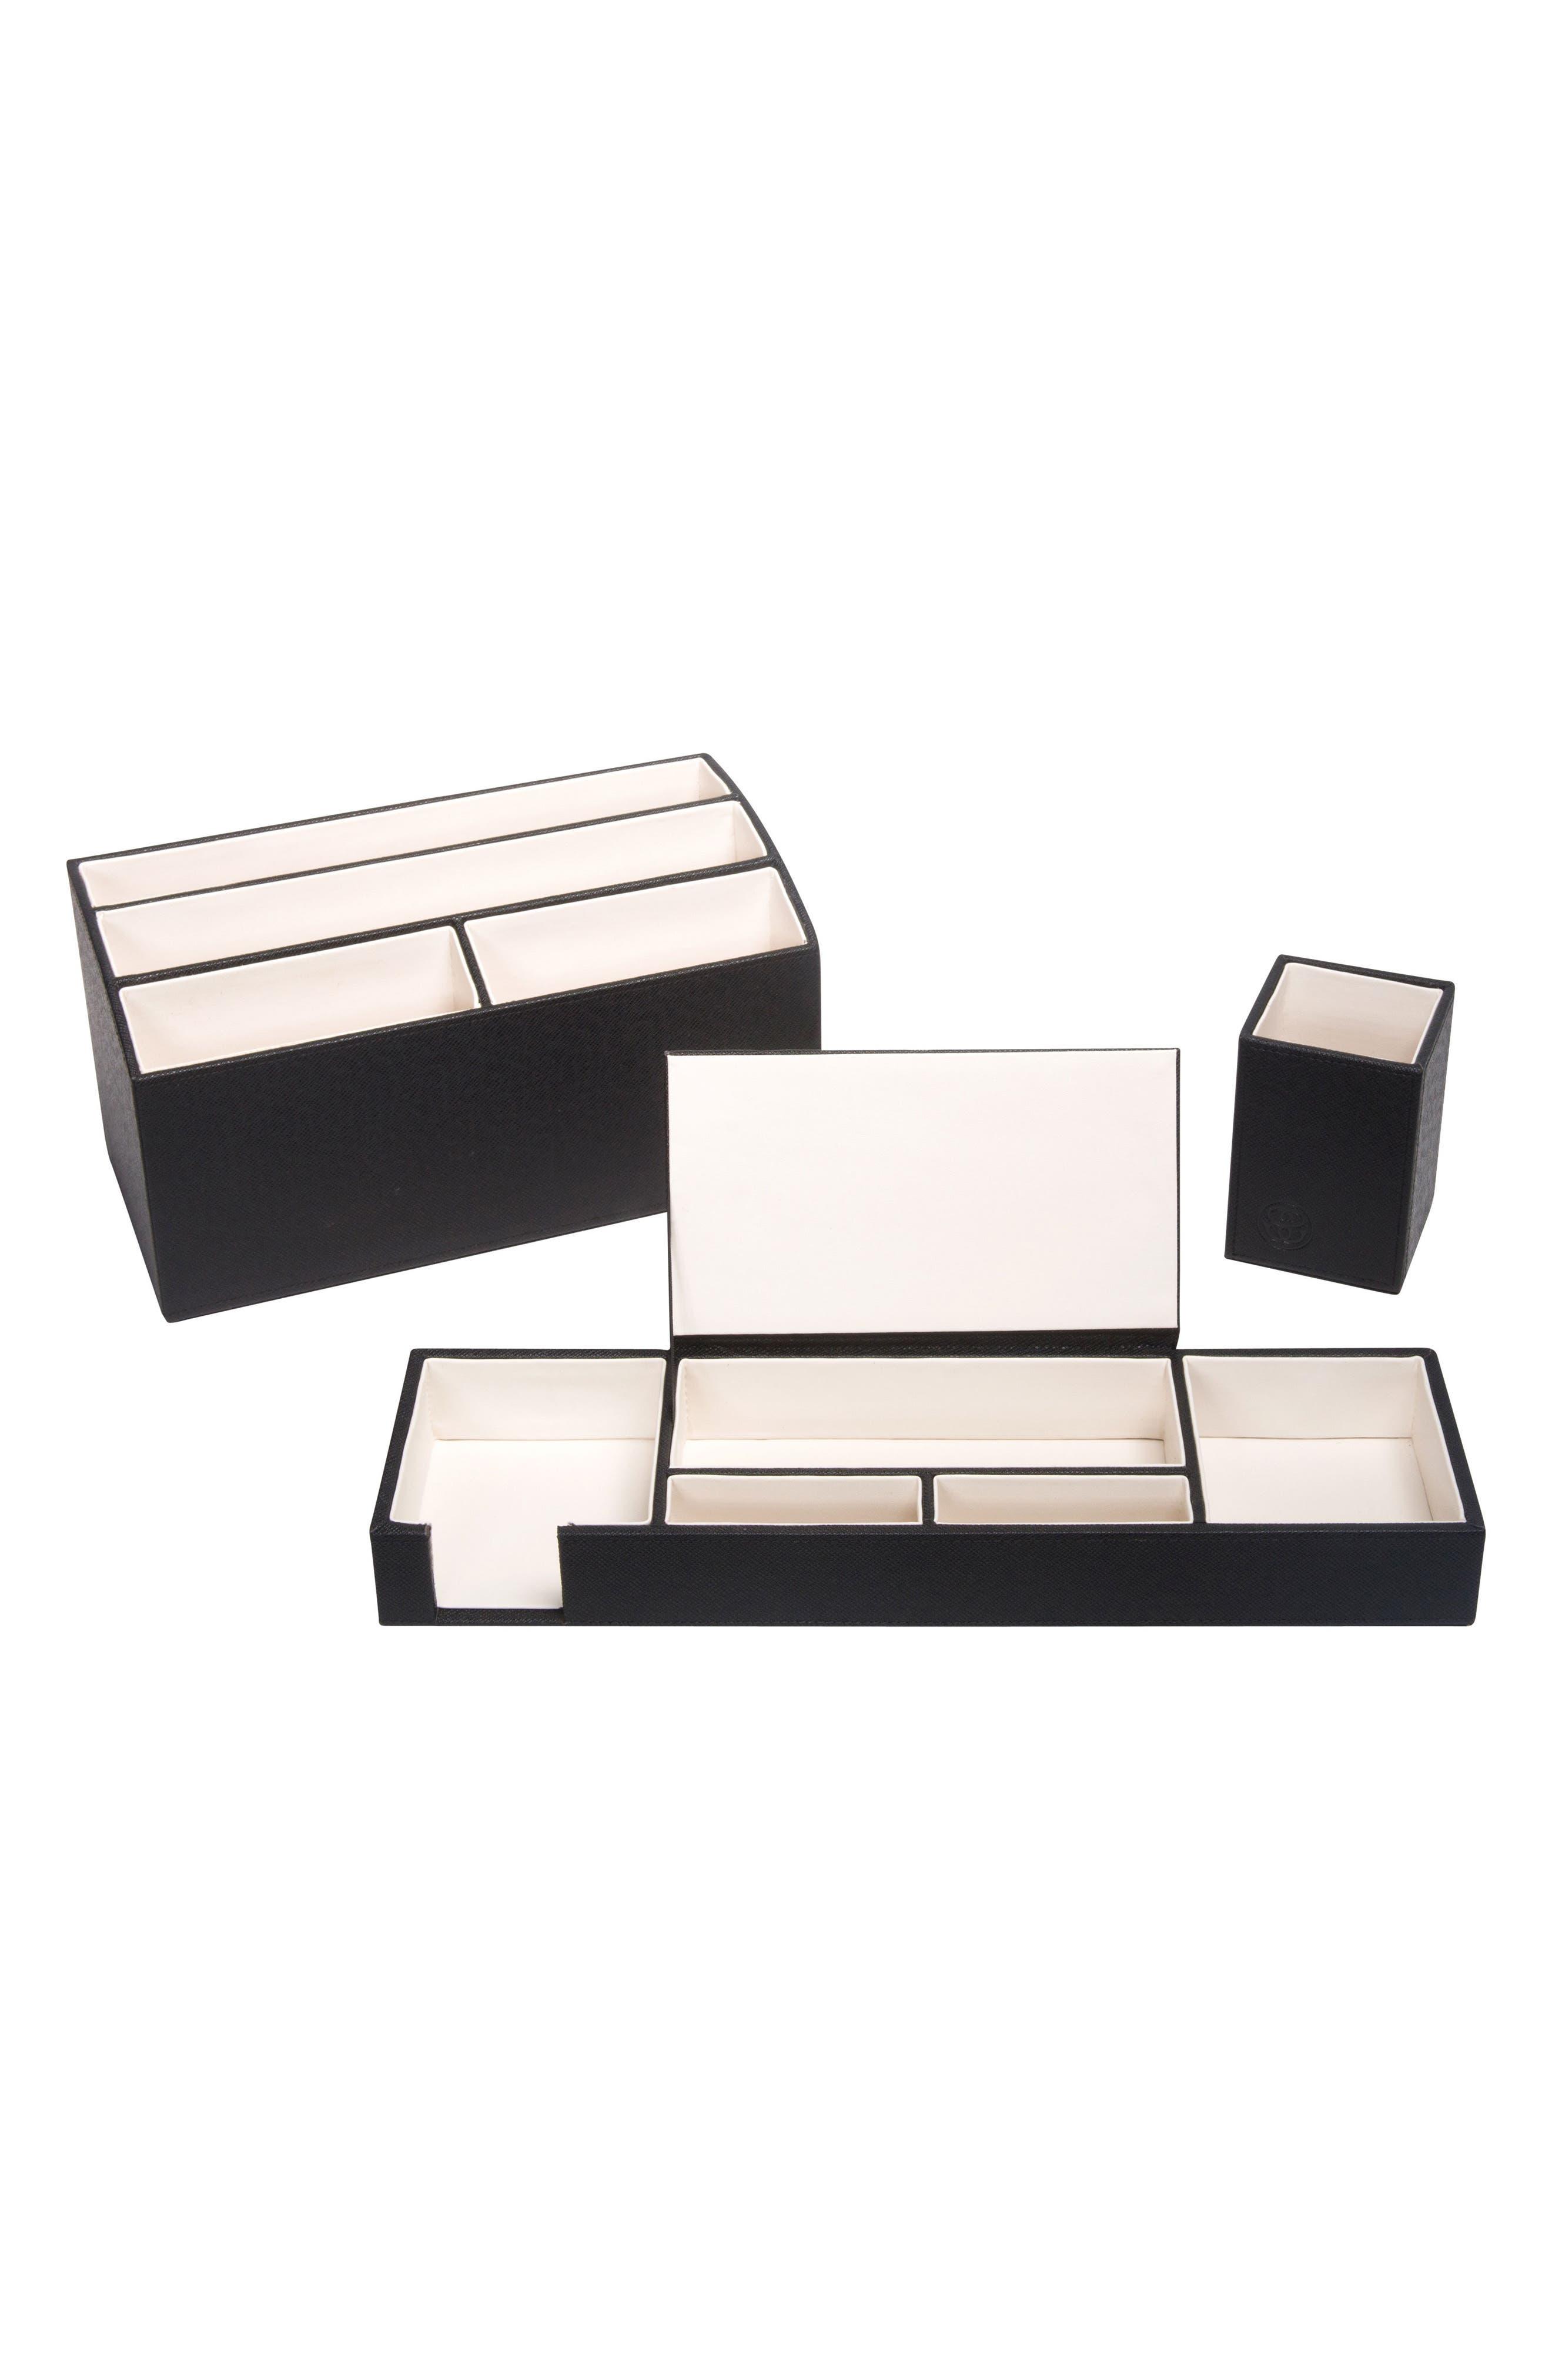 3-Piece Desk Organizer Set,                         Main,                         color, BLACK/ IVORY